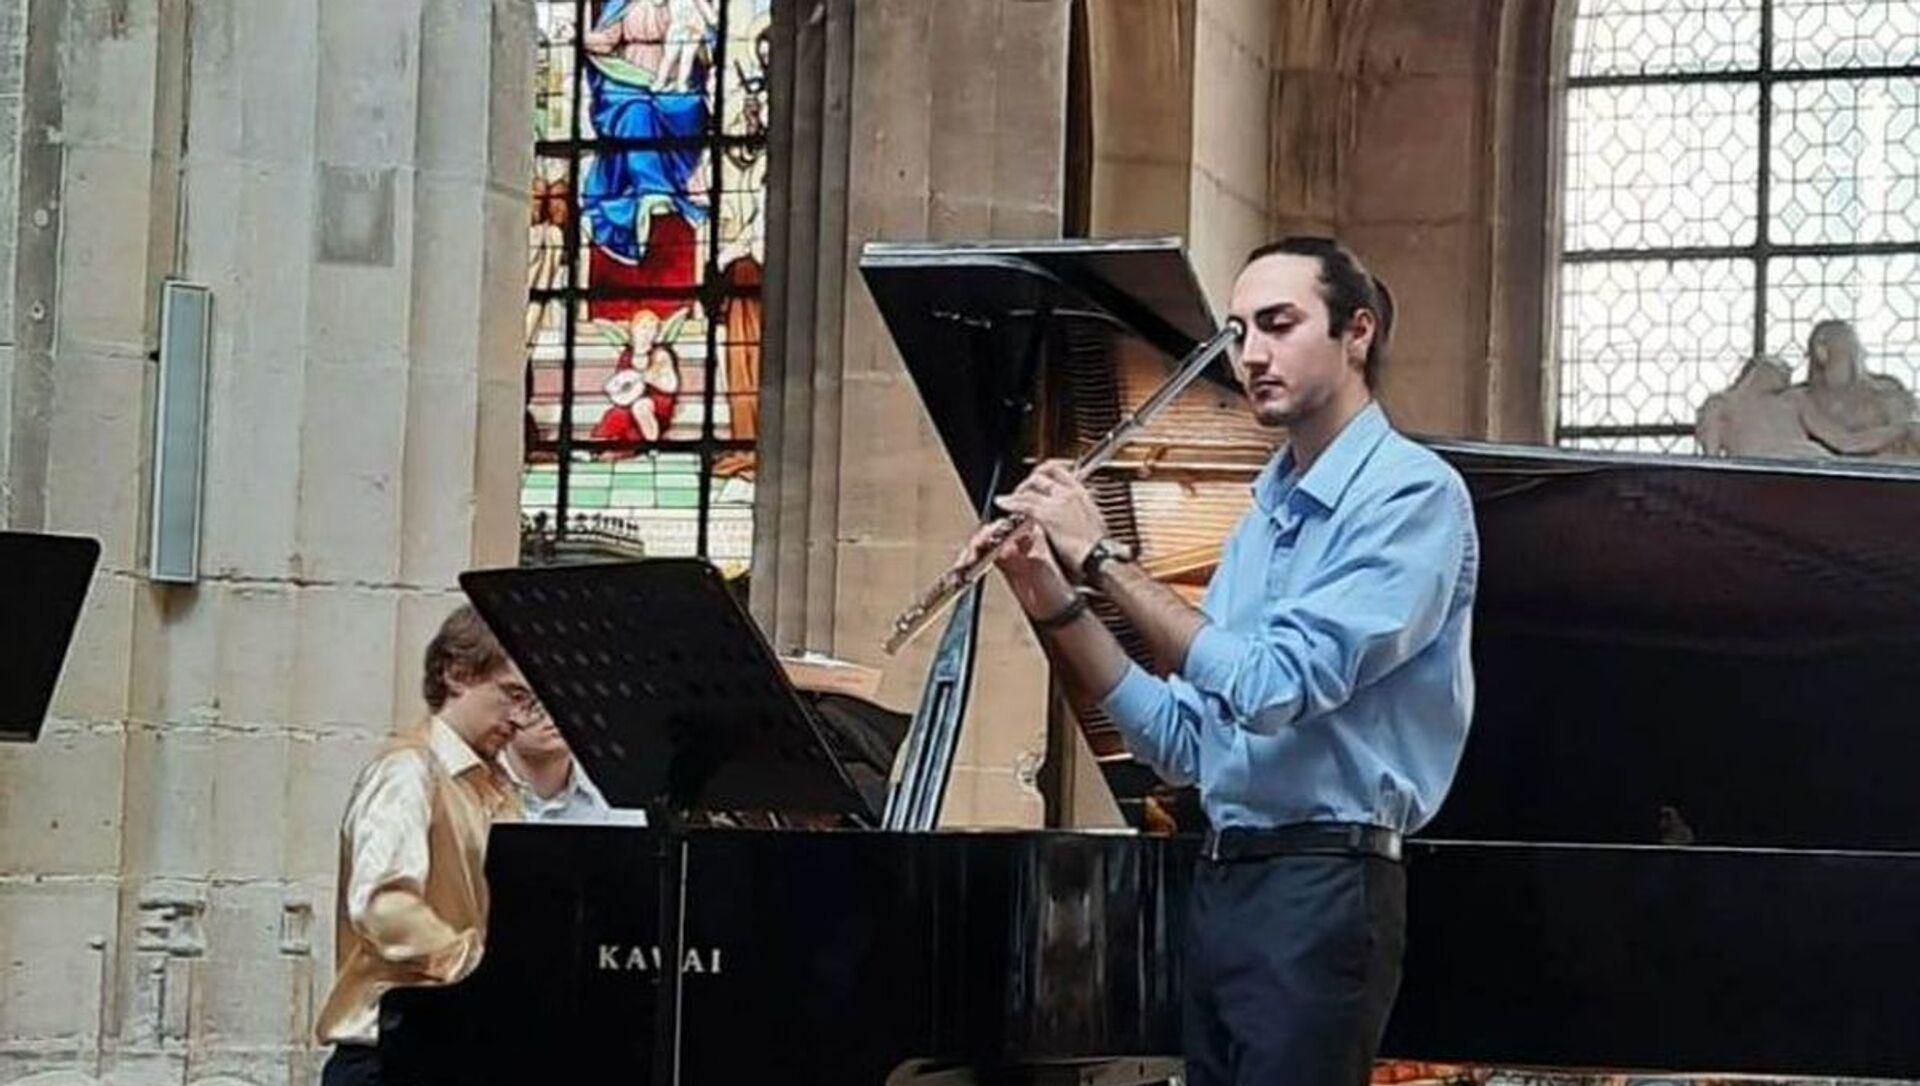 Концерт азербайджанского флейтиста Агарагима Гулиева - Sputnik Азербайджан, 1920, 10.08.2021